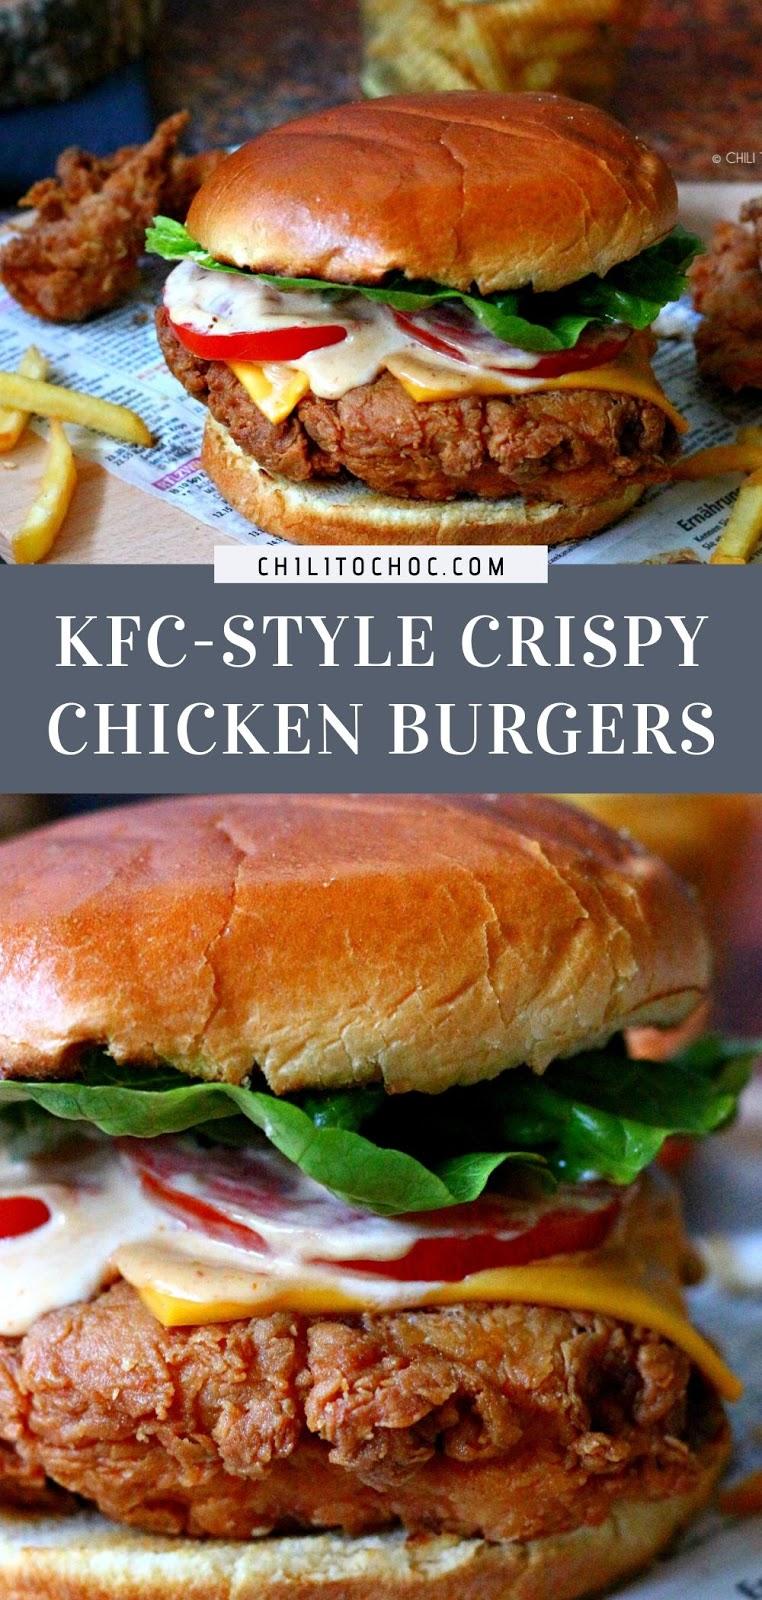 KFC-Style Crispy Chicken Burger (Zinger Burger) - pinterest